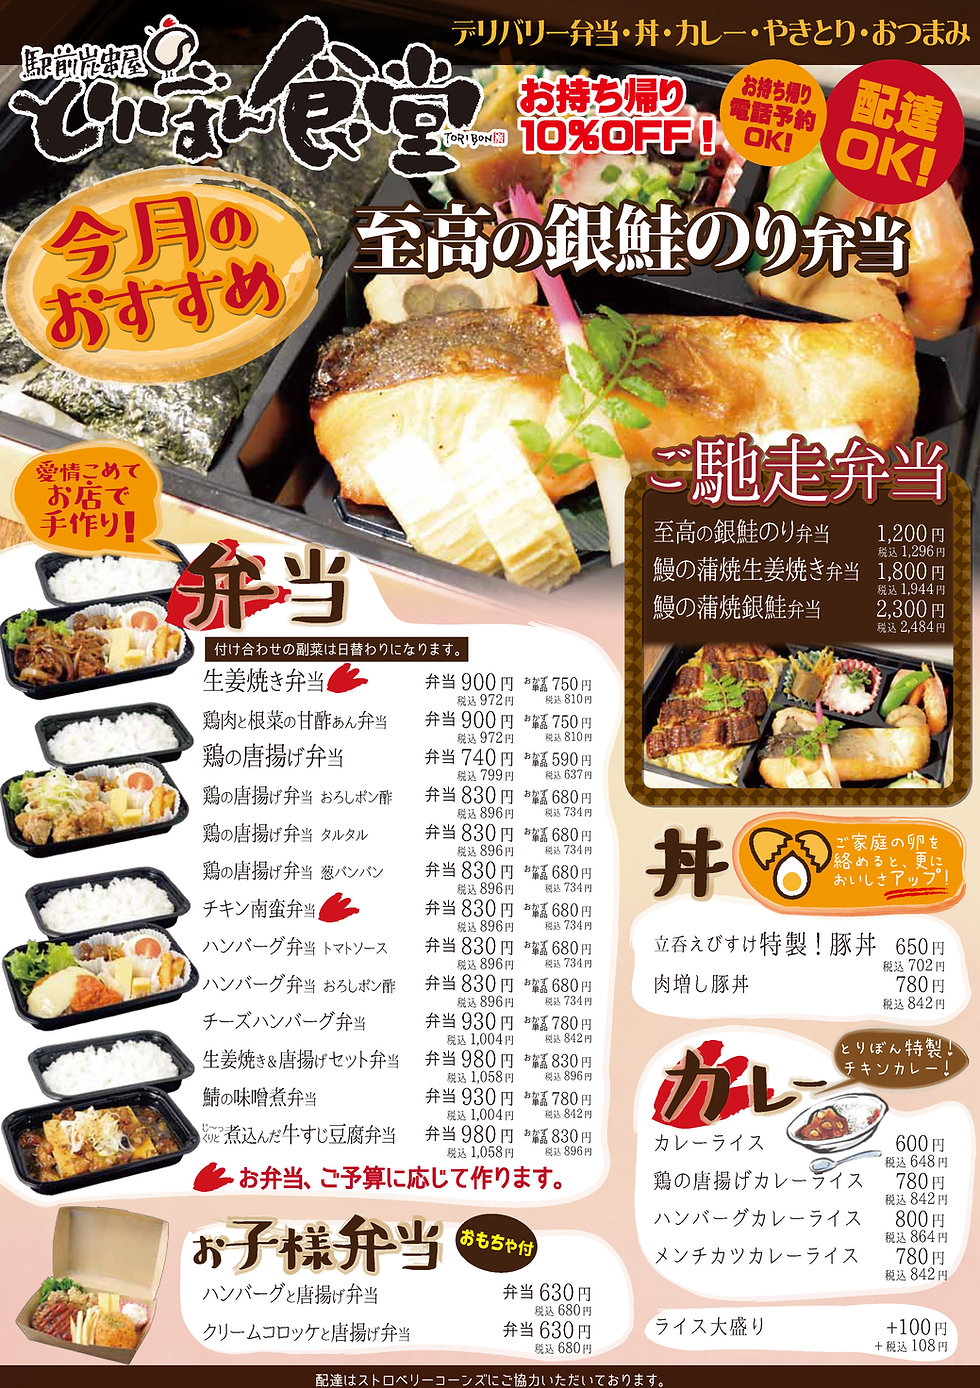 menu_Toribon Shokudo a.jpg